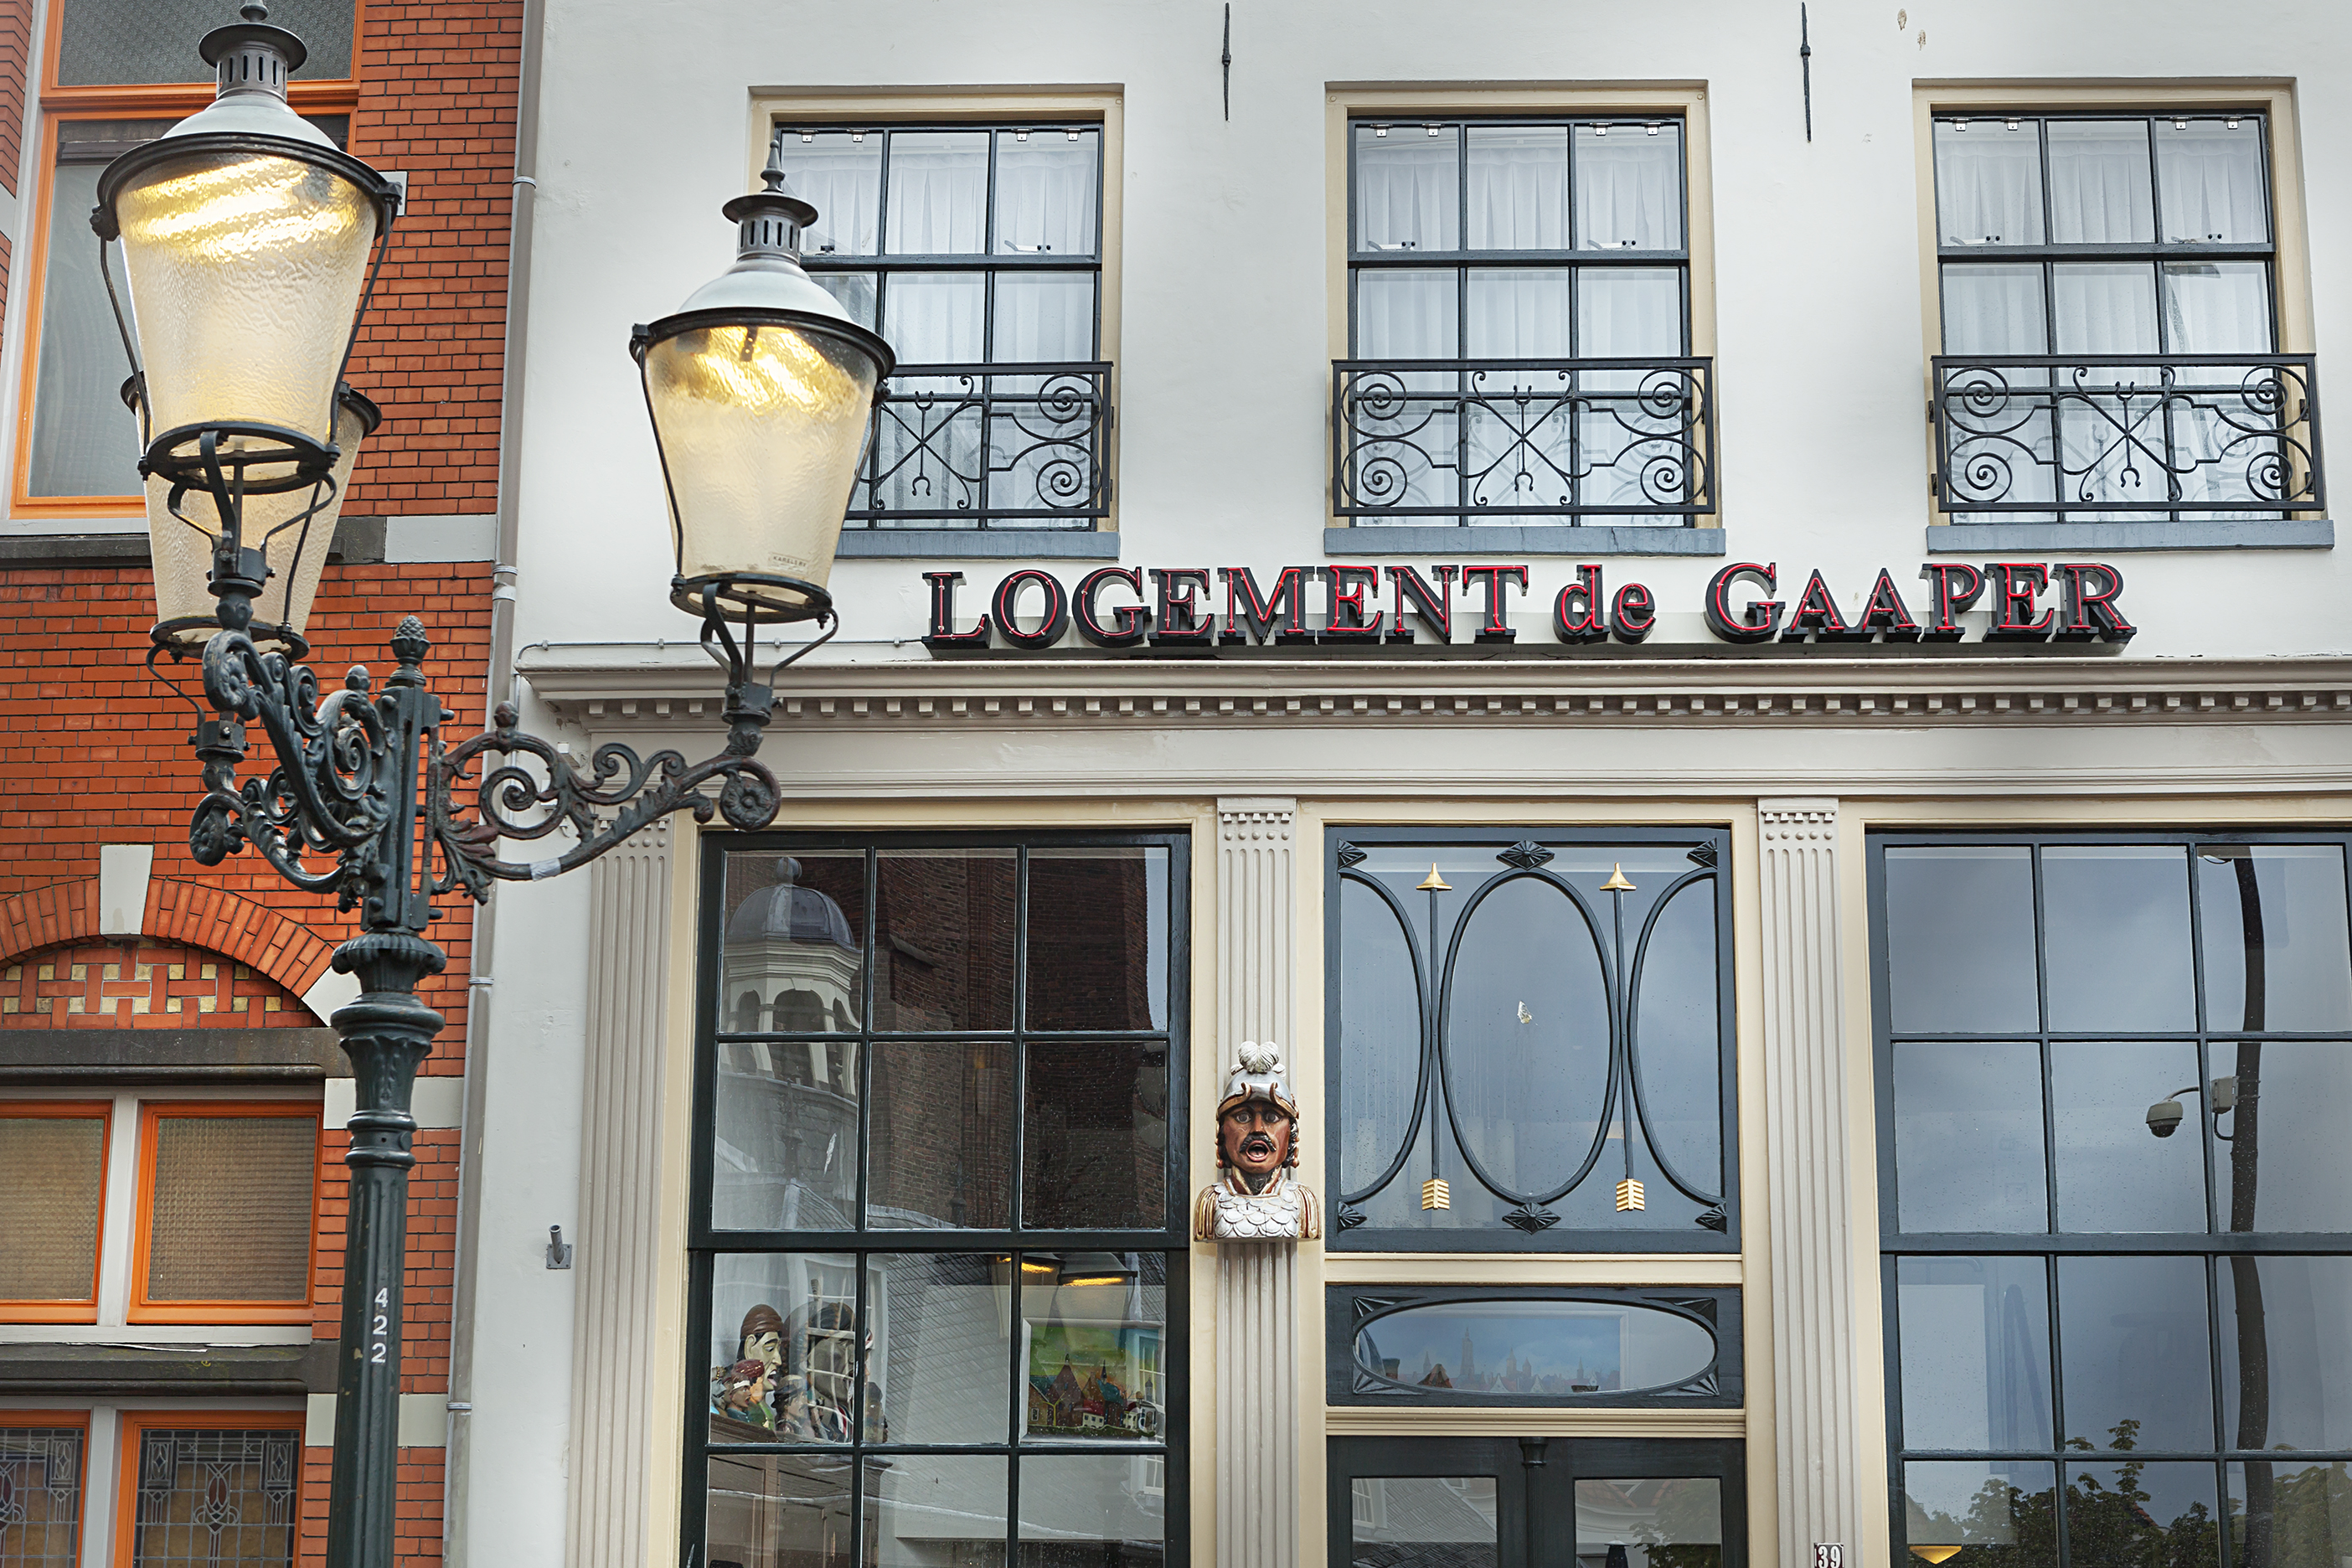 Hotel de Gaaper Amersfoort gevel